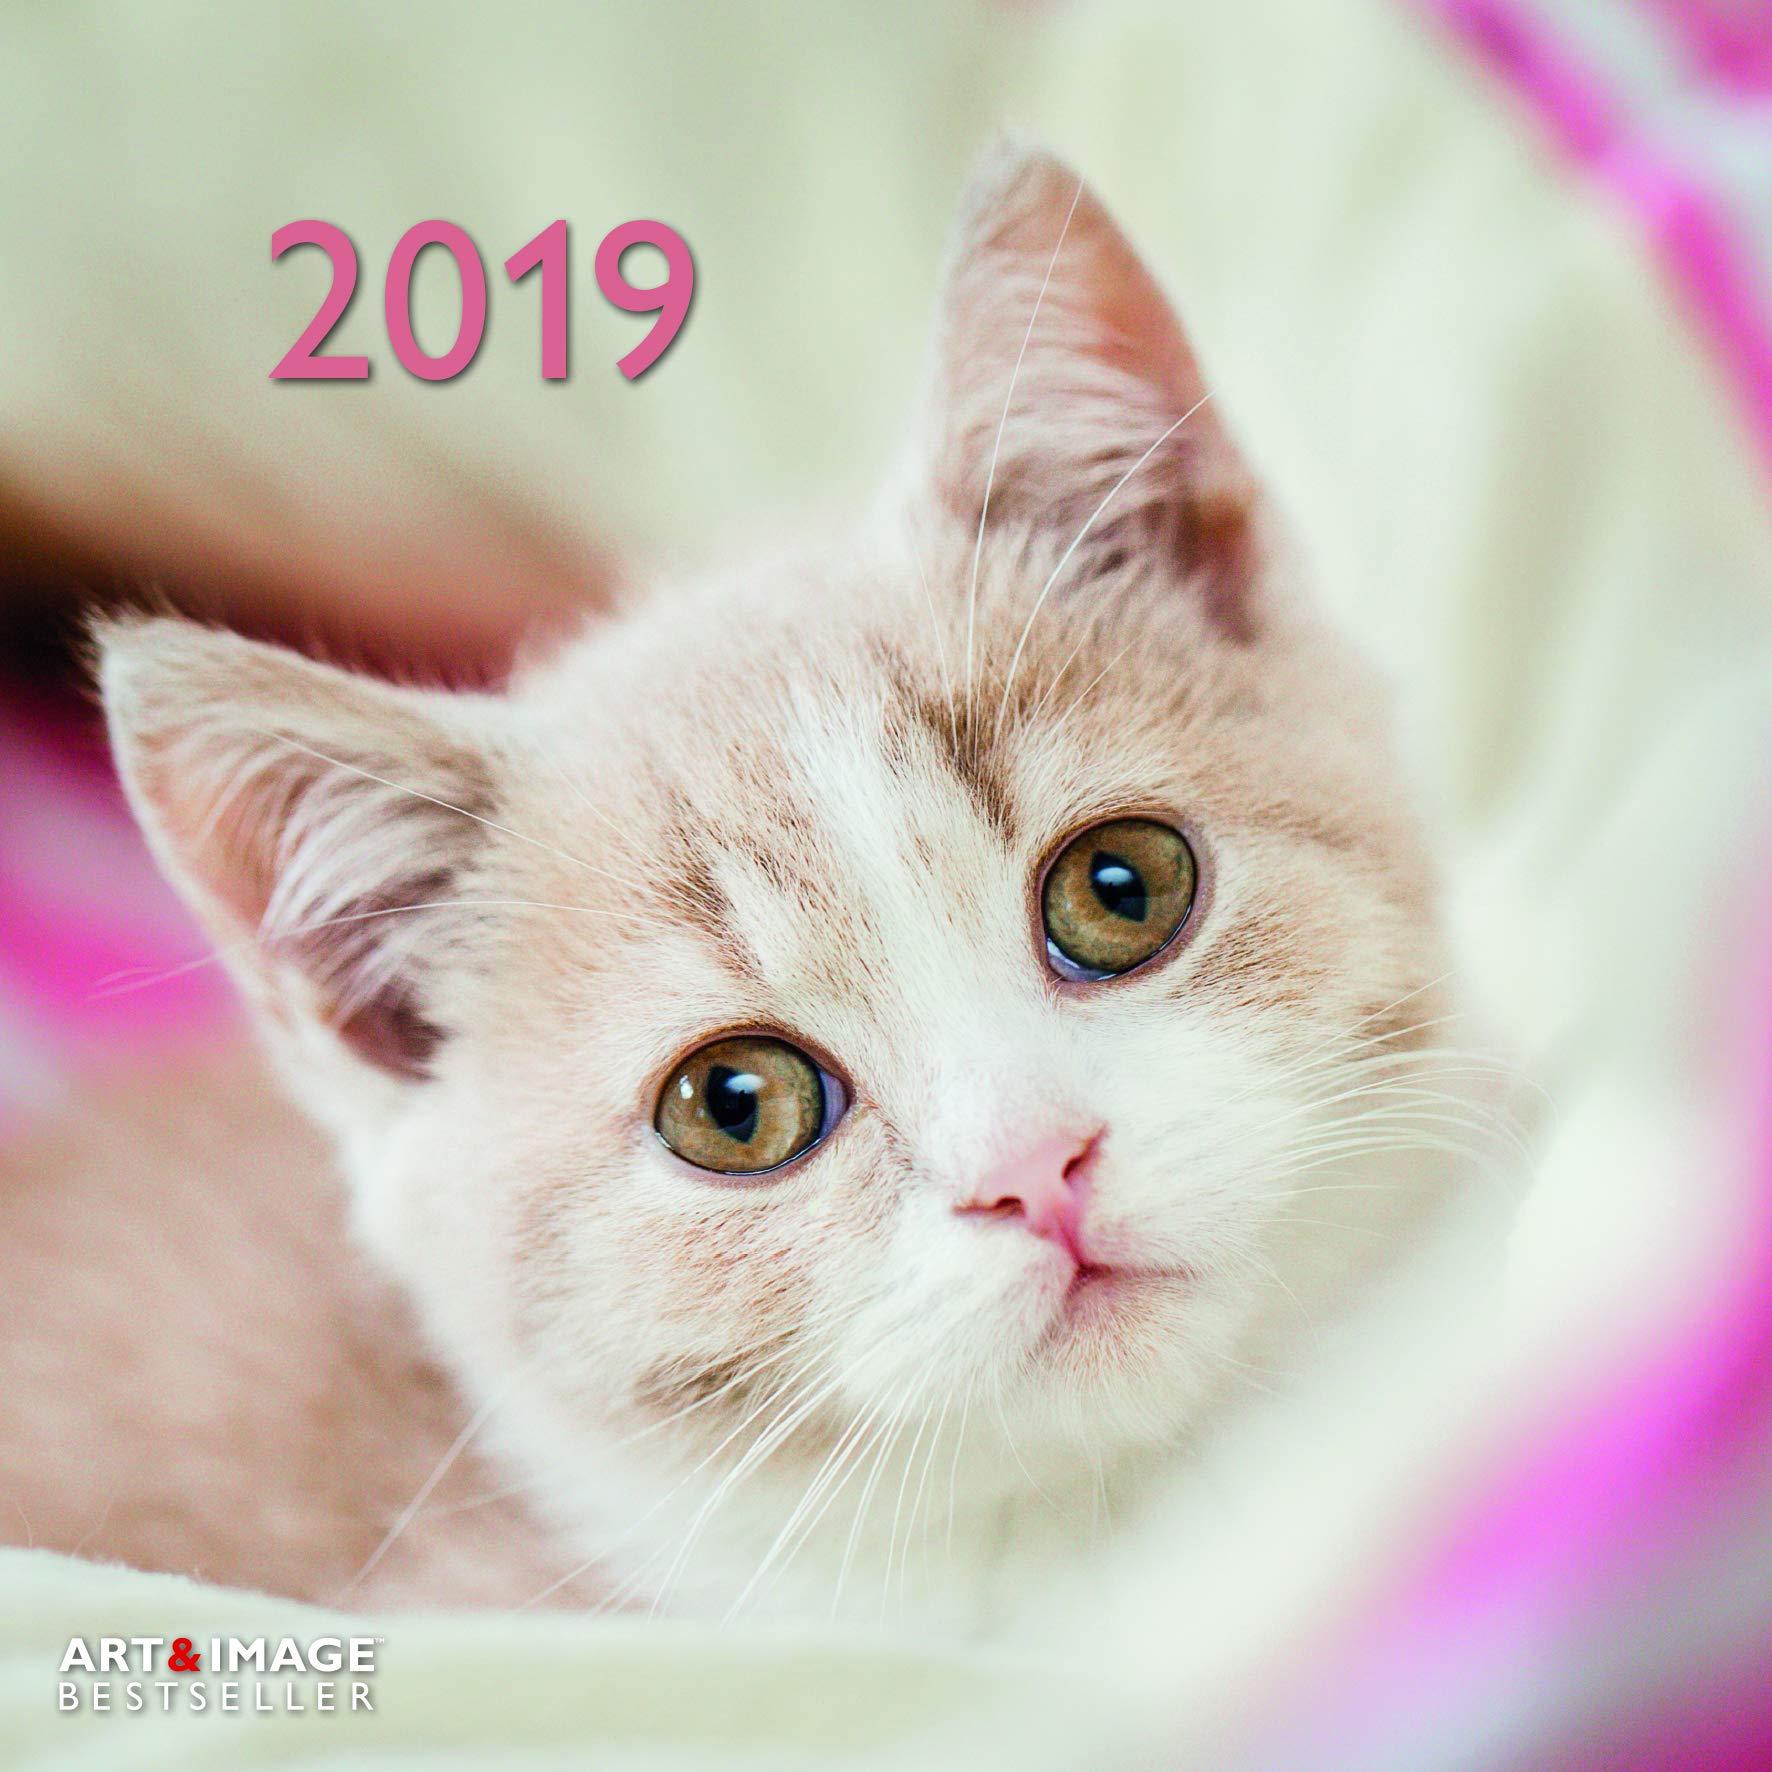 Calendario 2019 gato Rigolo con Póster – gato Funny – gato Baille – gato gafas – Leona – formato 30 x 30 cm (TN) + incluye un – Agenda de bolsillo 2019: Amazon.es: Oficina y papelería